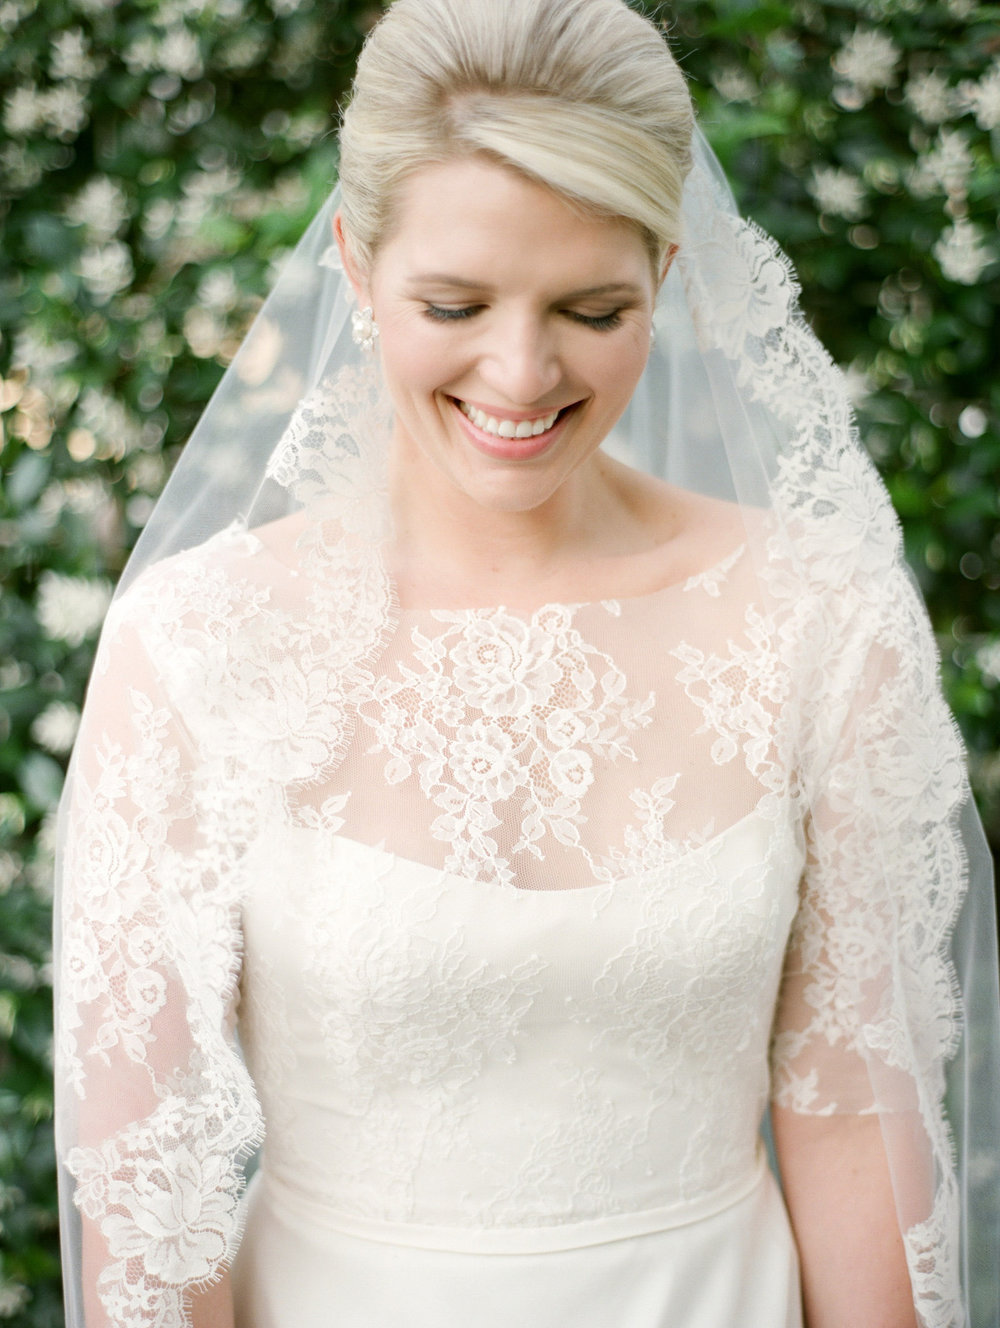 0001_0001_Houston-Film-Bridal-Photographer.jpg